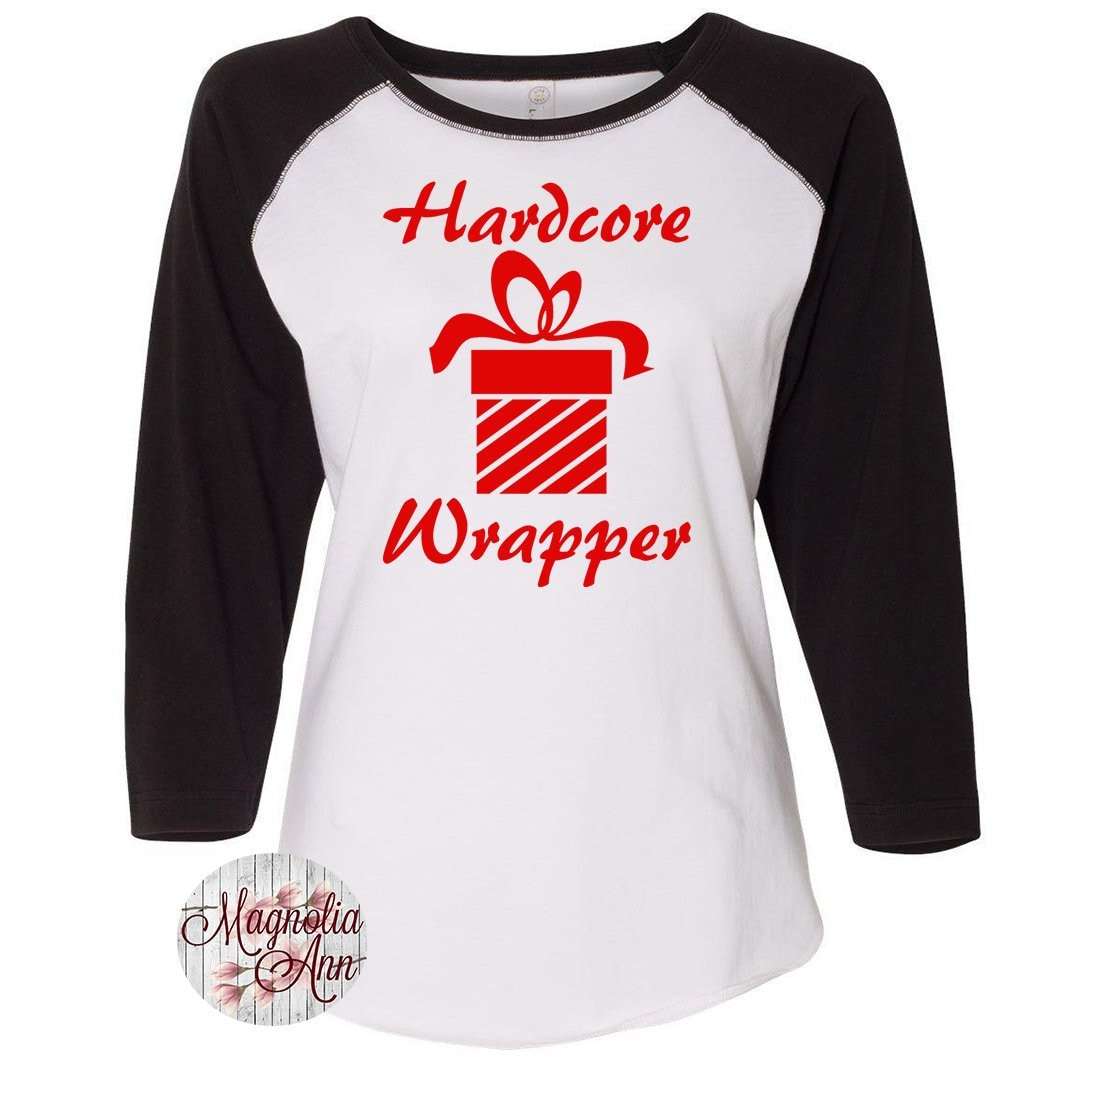 Family Christmas Shirts.Hardcore Wrapper Christmas Shirts Matching Christmas